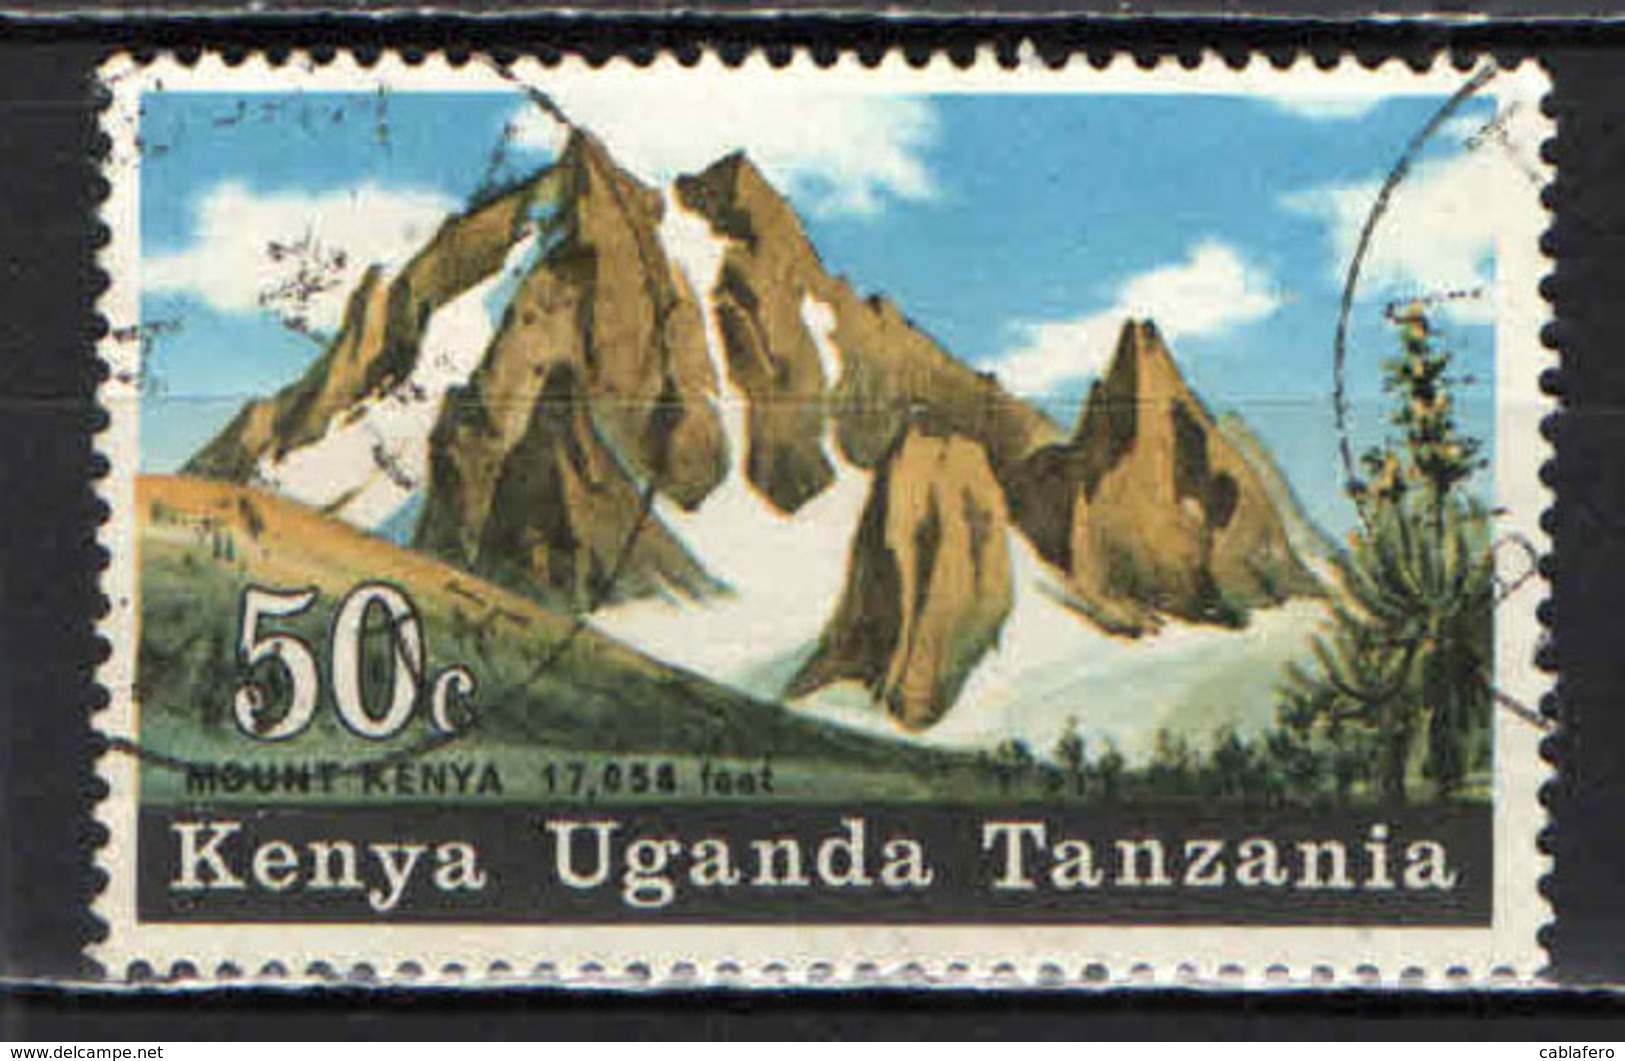 KENYA-UGANDA-TANZANIA - 1968 - MONTAGNA DELL'AFRICA - USATO - Tanzania (1964-...)